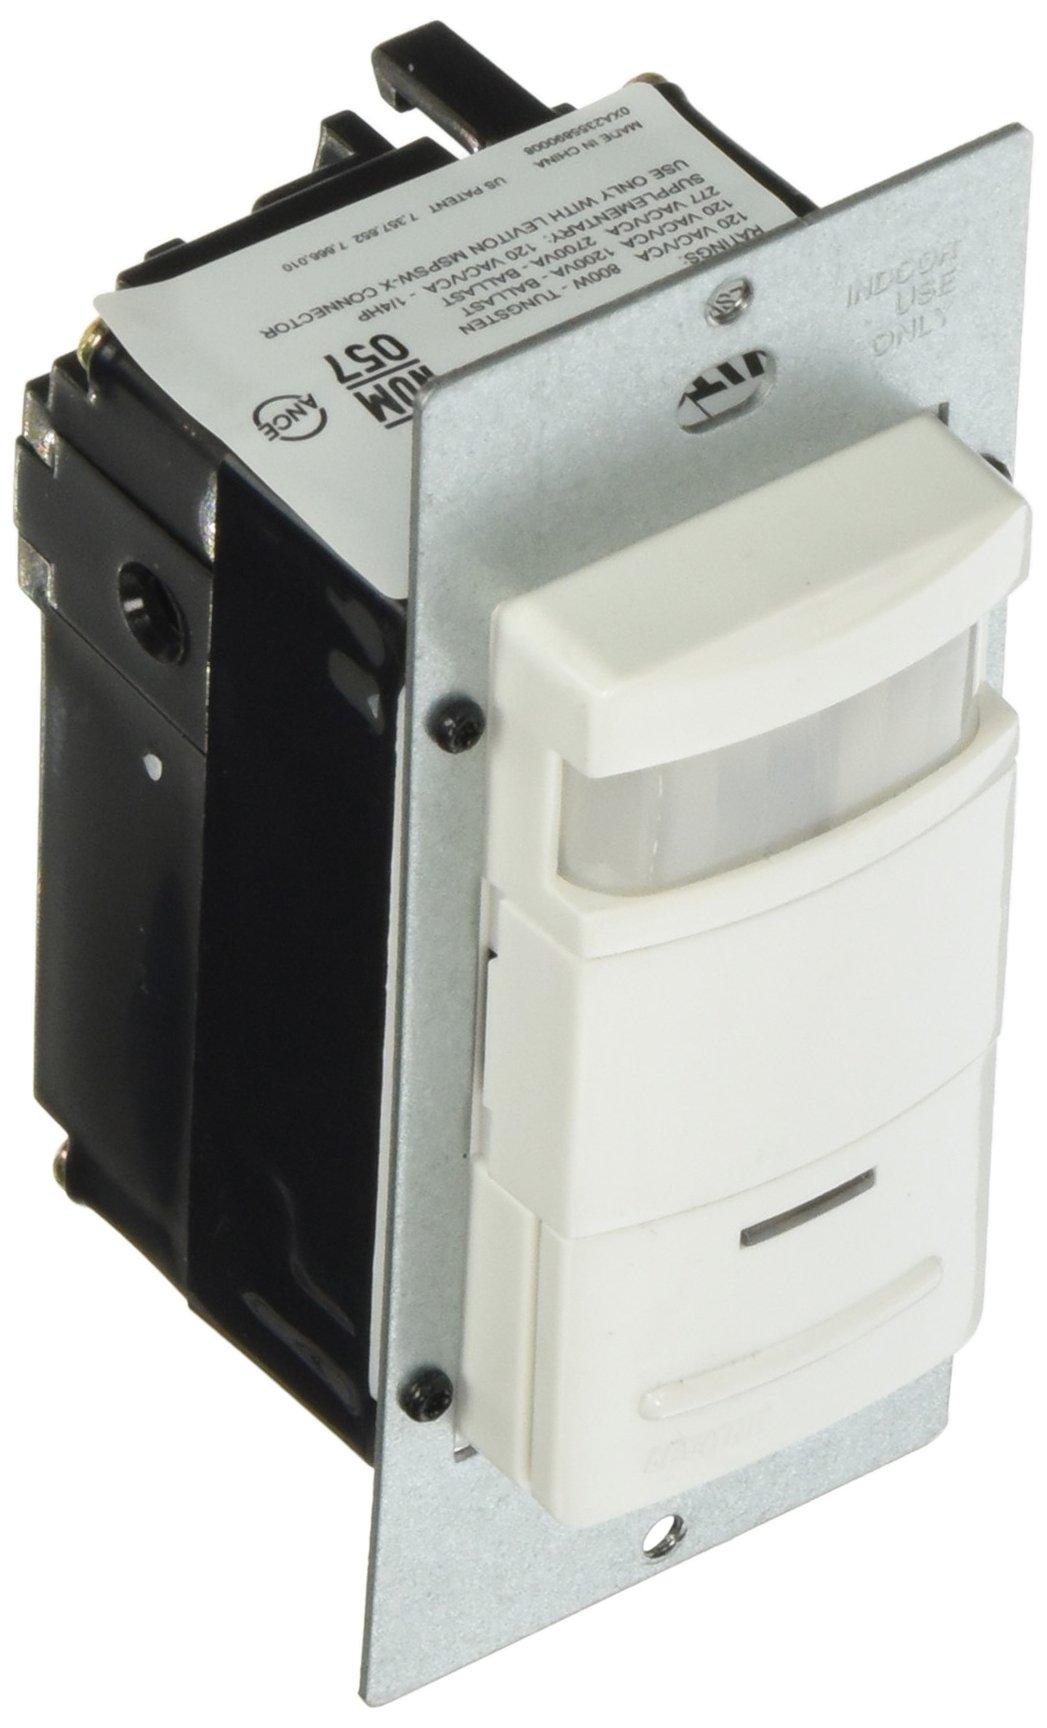 Leviton MDS10-I Lev-Lok Modular Wiring Device DW PIR Wall Switch Occupancy Sensor, White